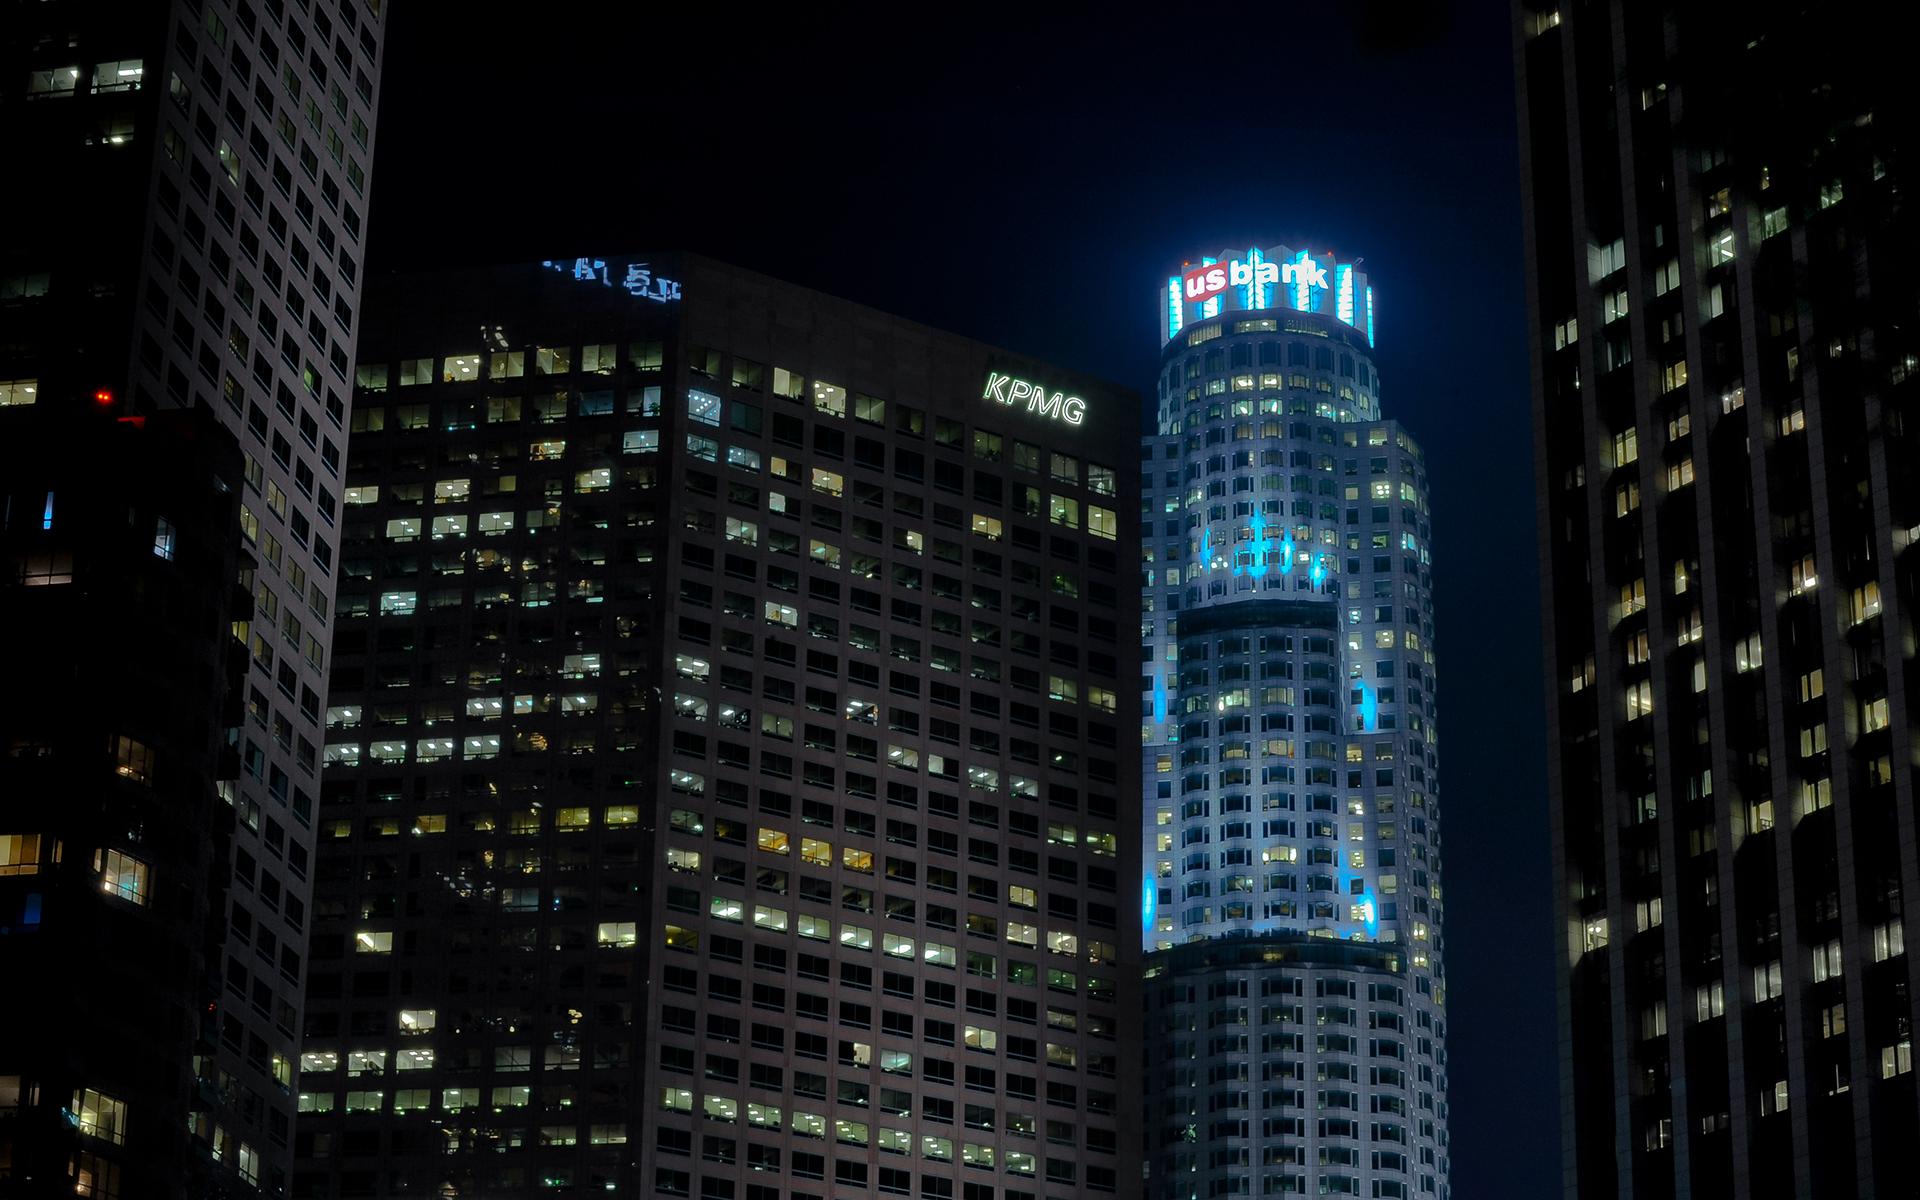 los angeles skyscrapers desktop wallpaper - photo #21